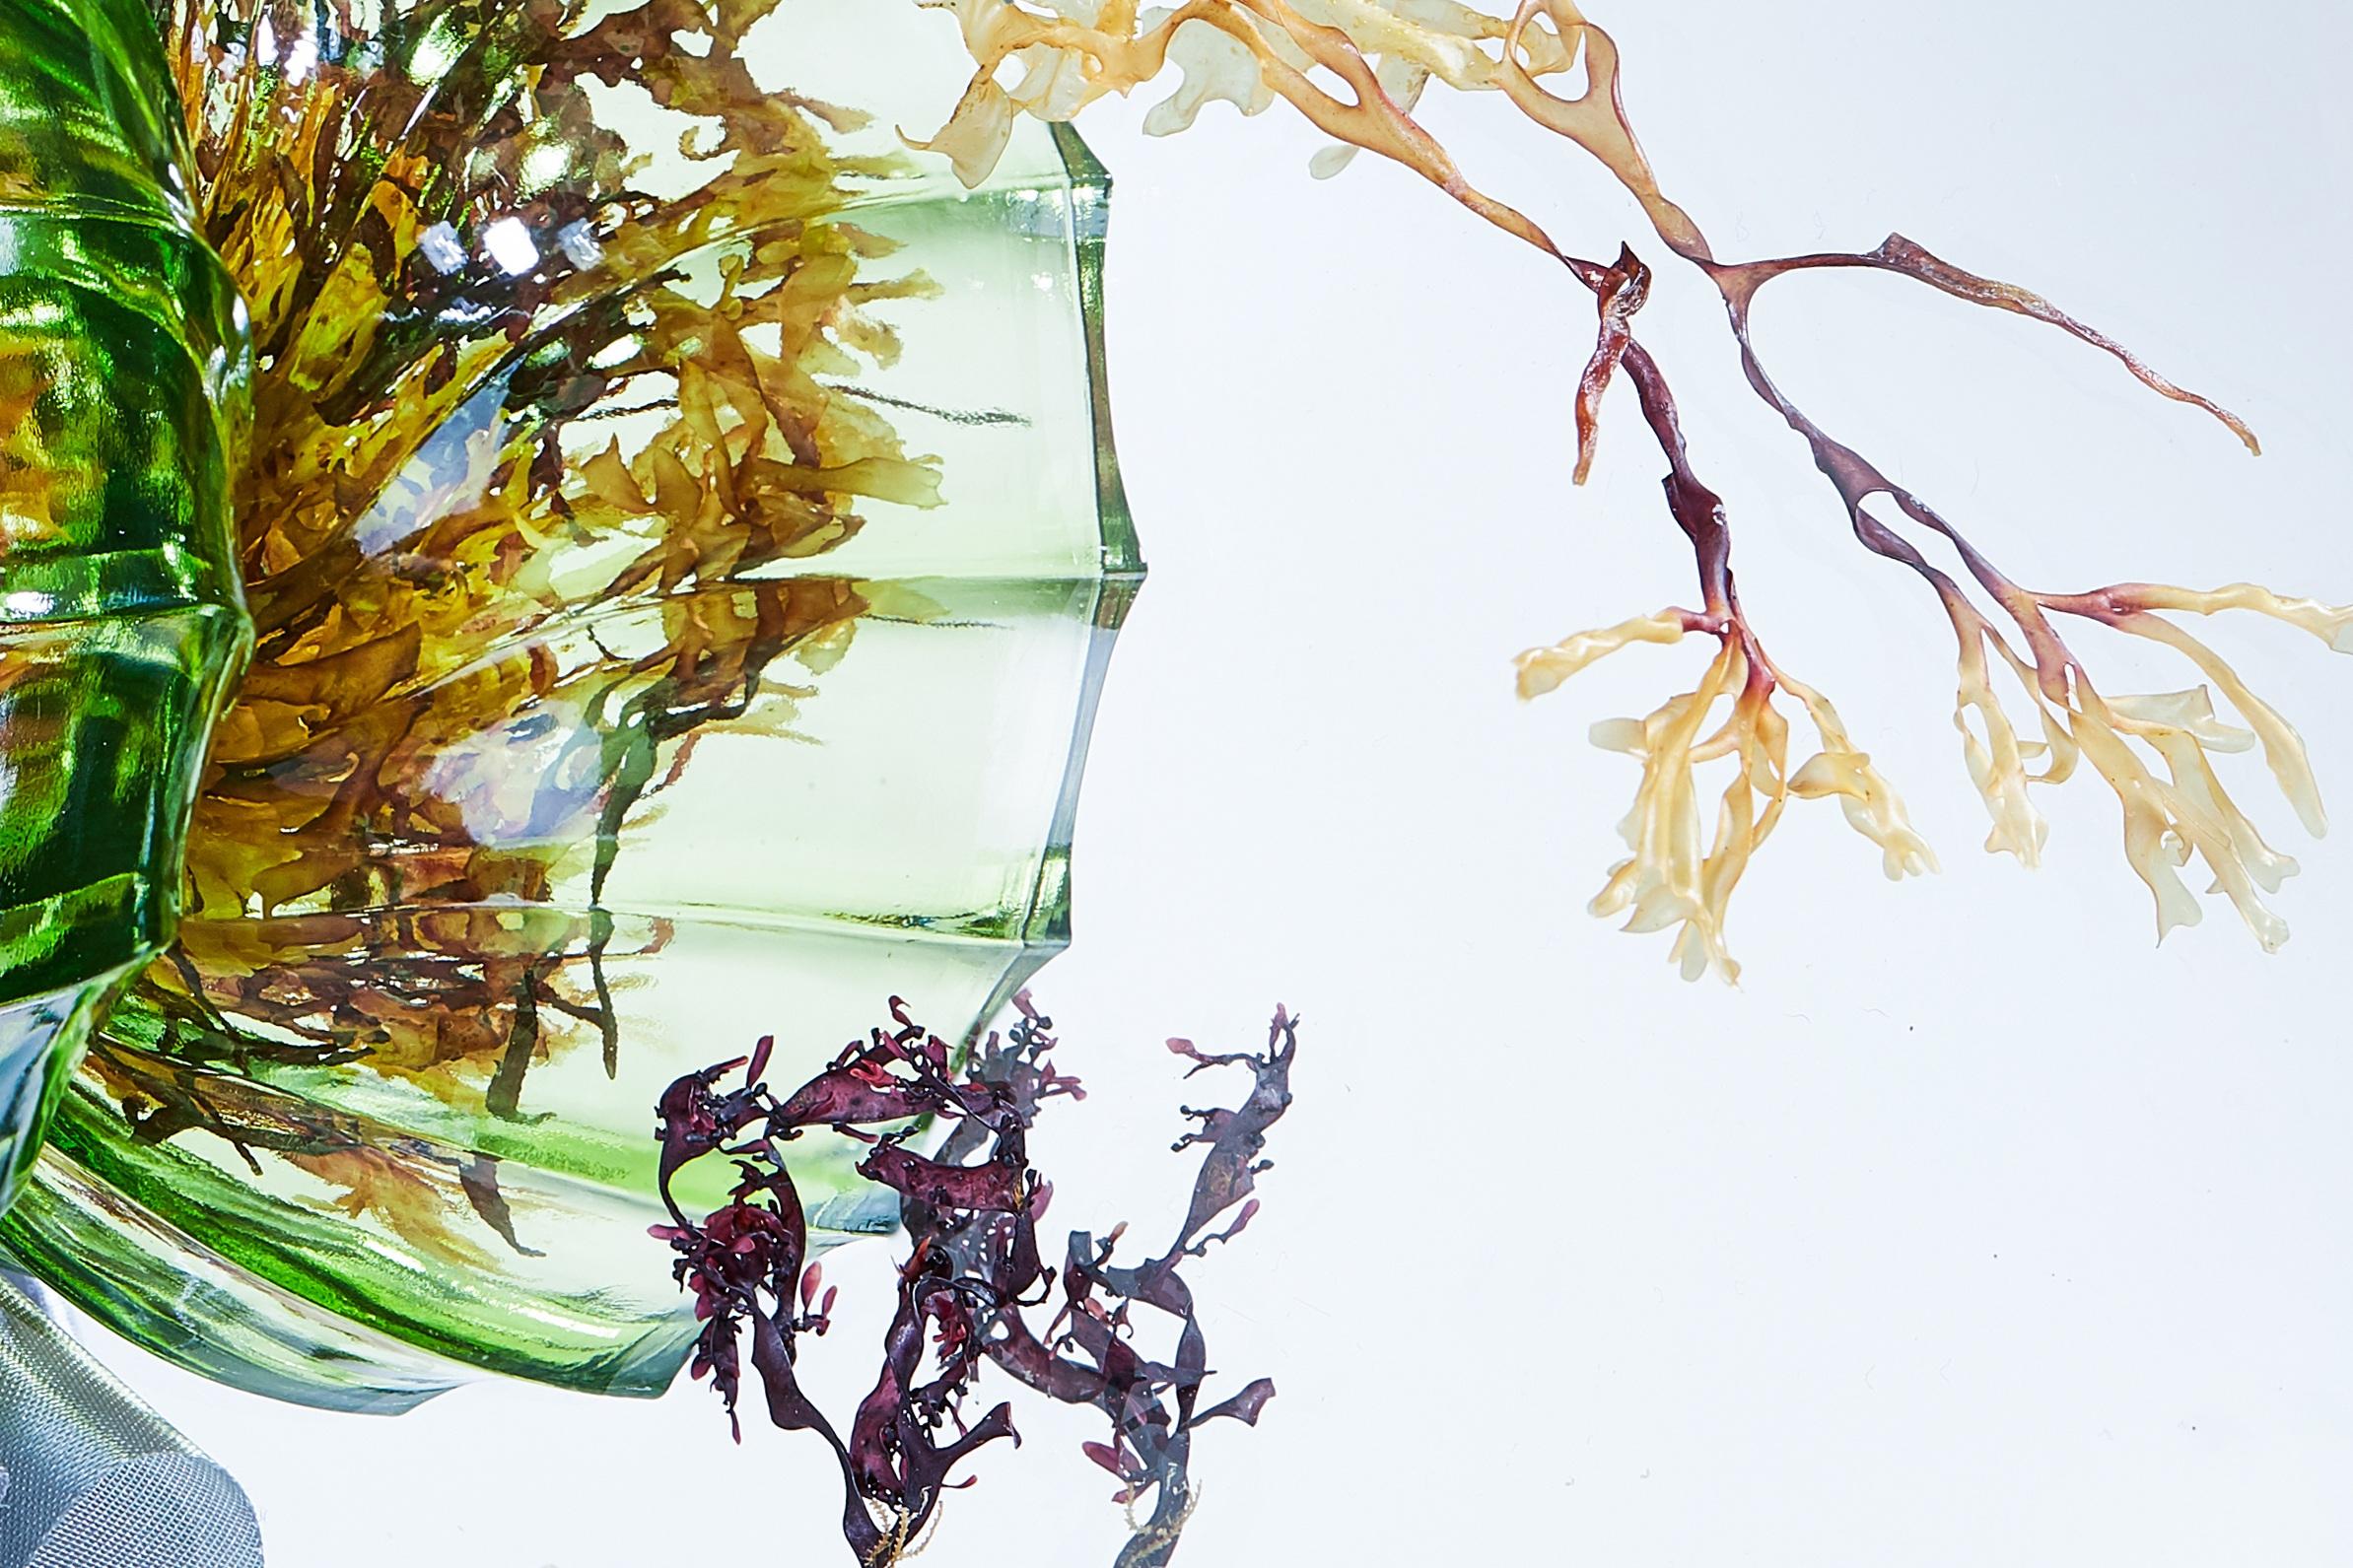 seaweed-stack-1-ed-sm copy-closeup-2.jpg